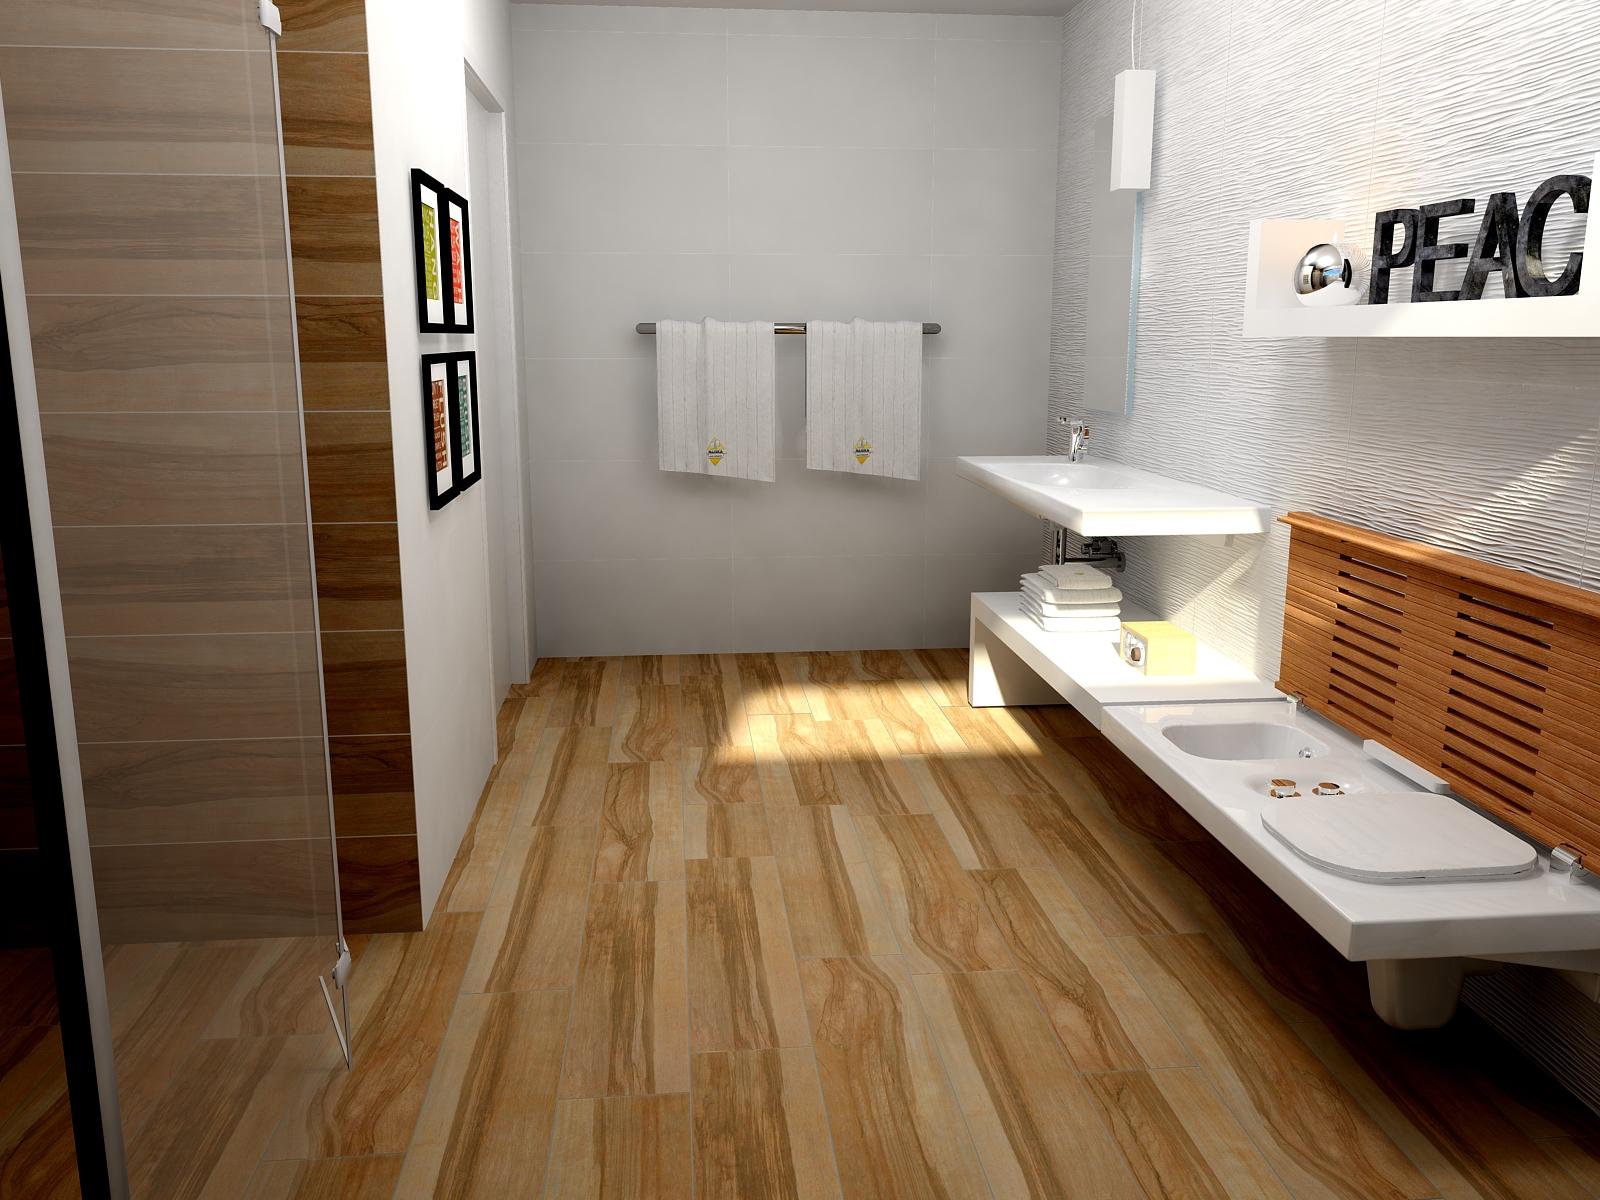 atlas concorde 3d wall design etic pro bathroom by. Black Bedroom Furniture Sets. Home Design Ideas